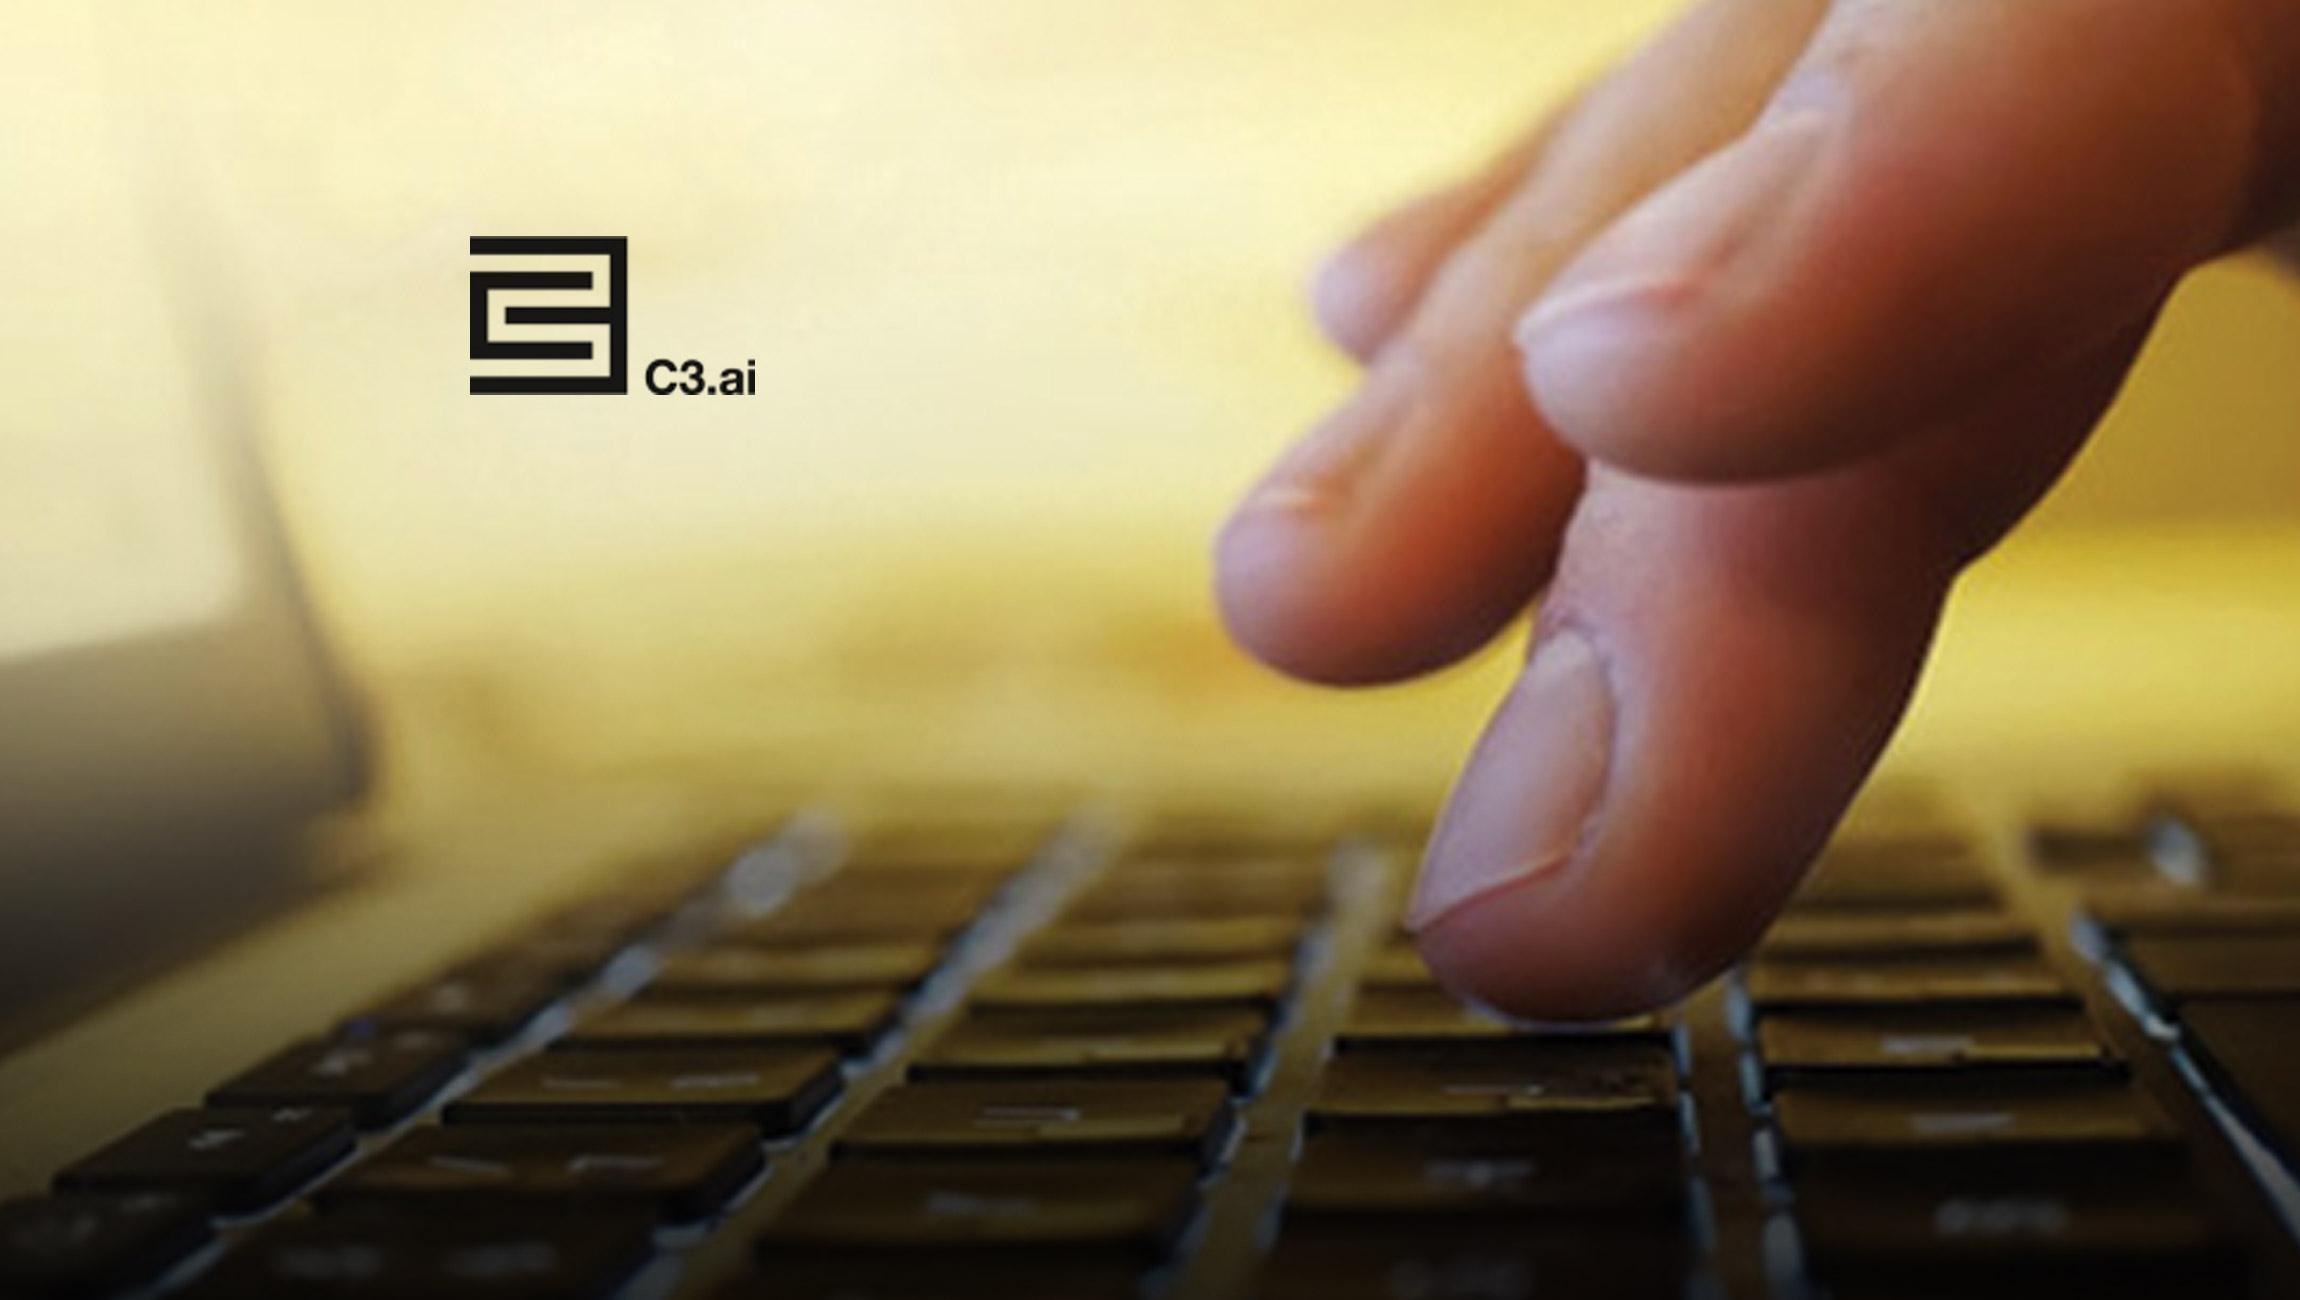 C3.ai Announces Launch of Initial Public Offering